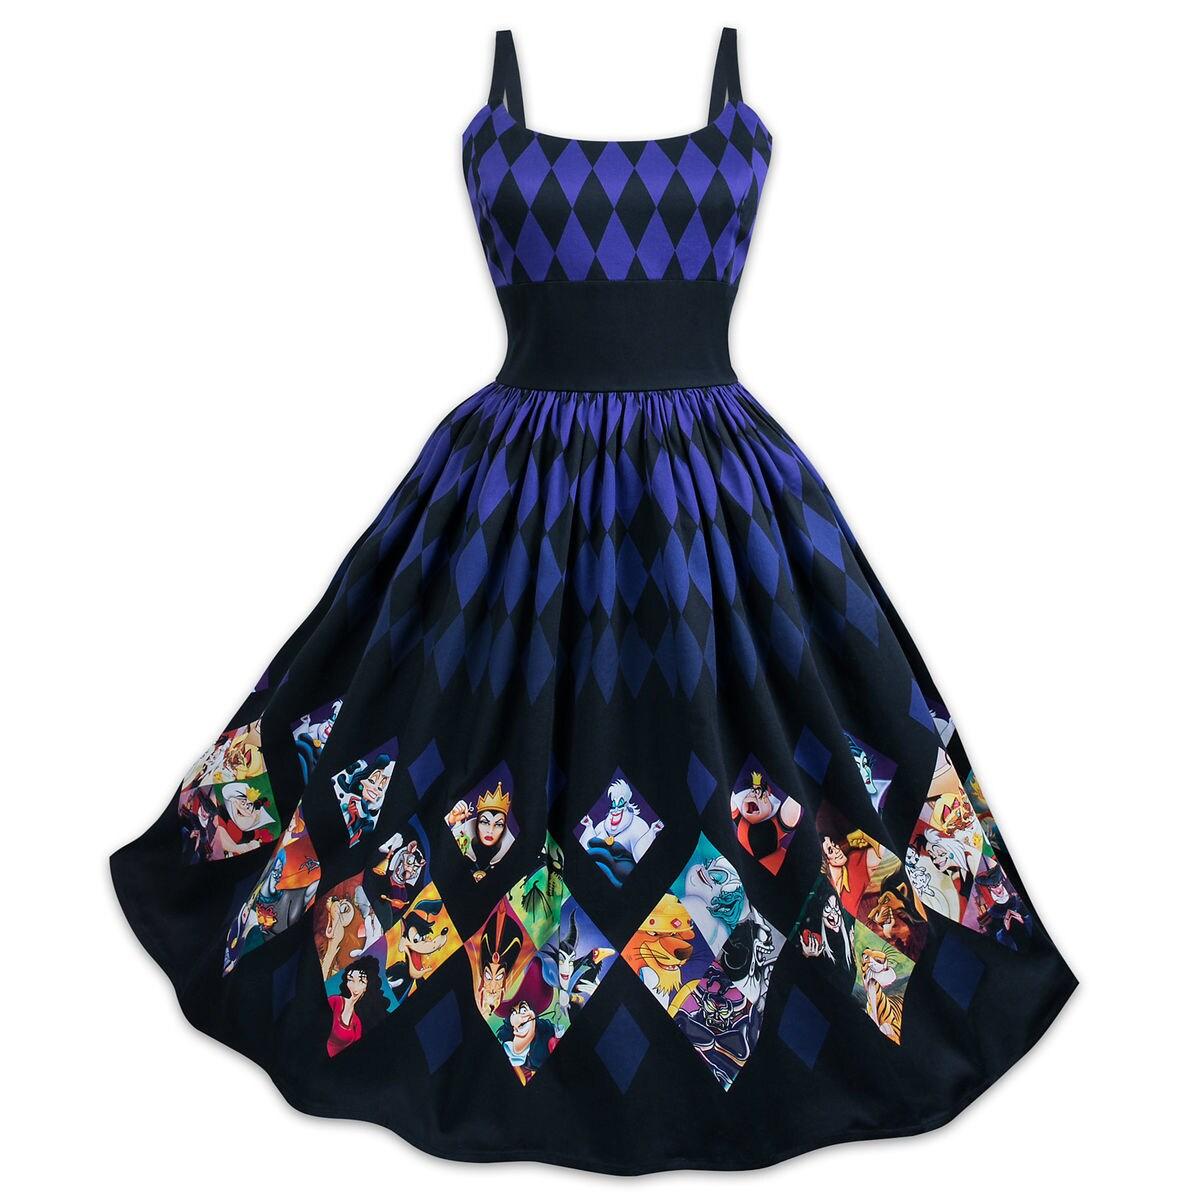 045b551ea4d Disney dresses womens